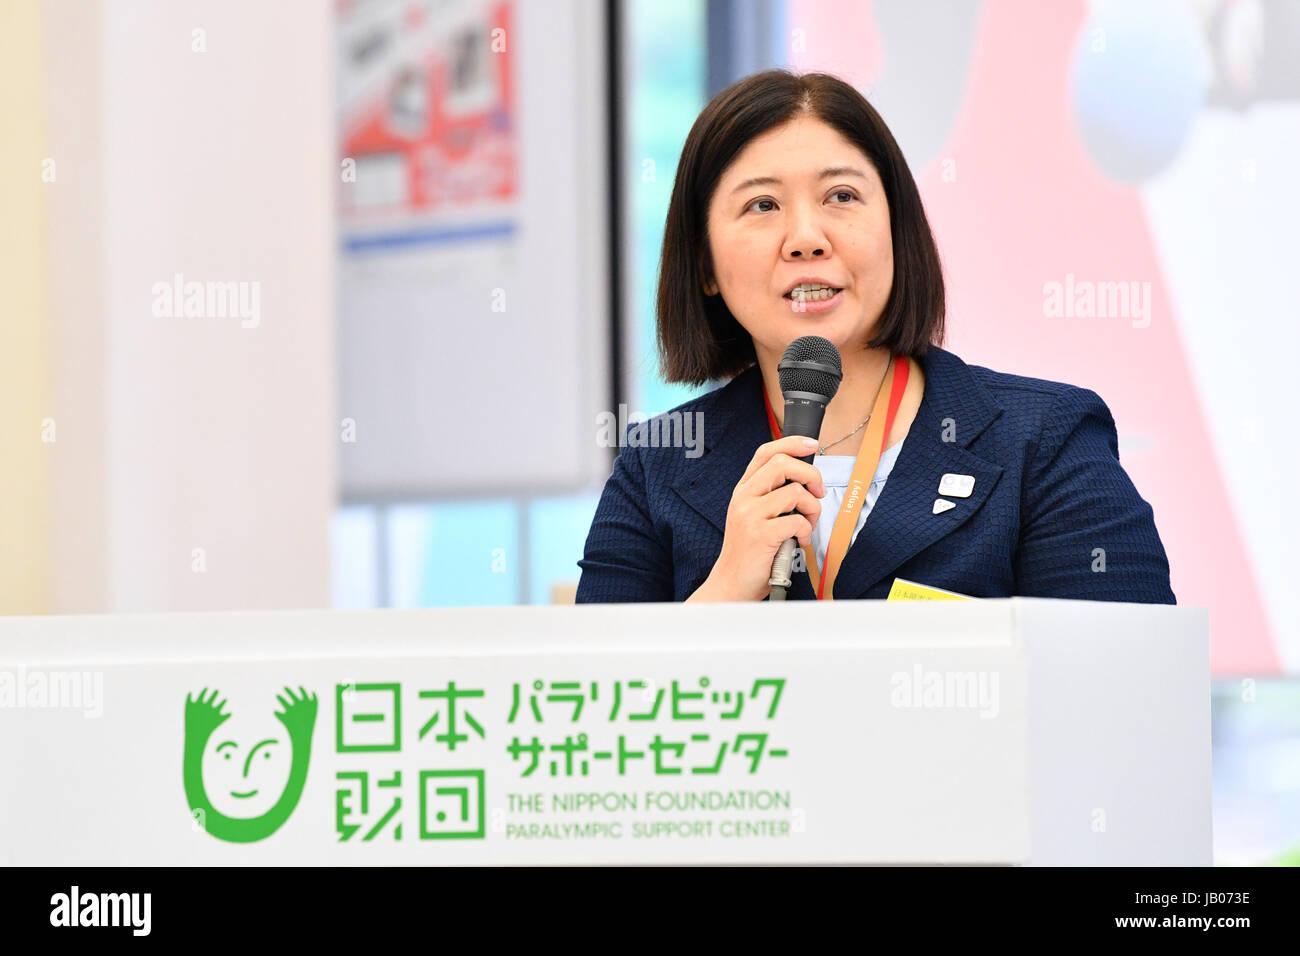 Kuniko Stock Photos & Kuniko Stock Images - Alamy